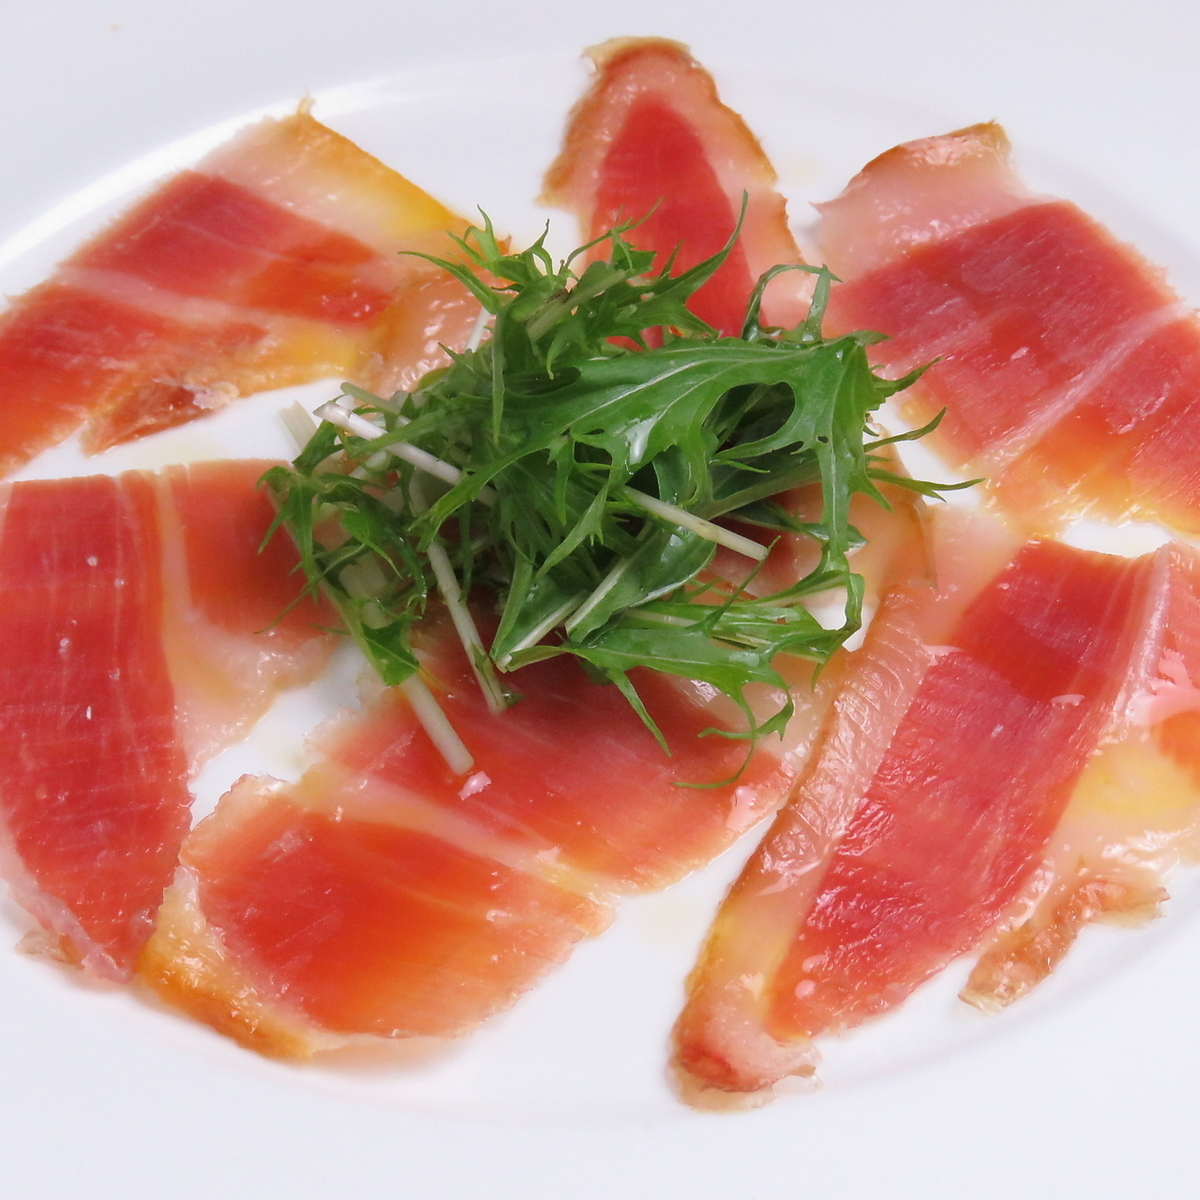 Assorted raw ham